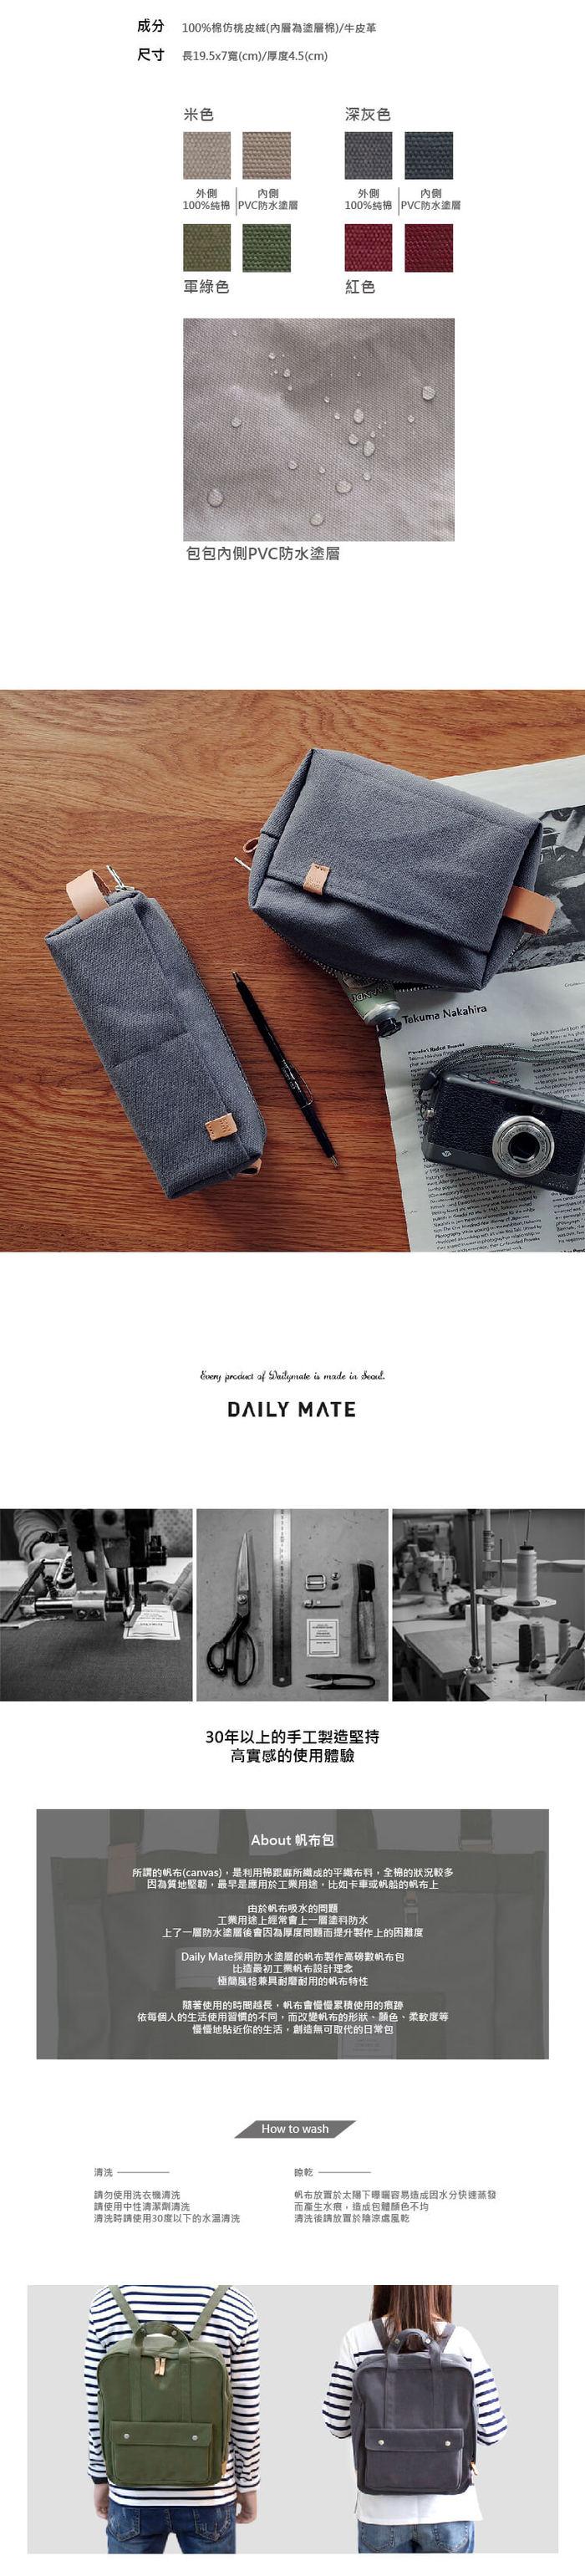 Daily mate|萬用鉛筆包(米色)